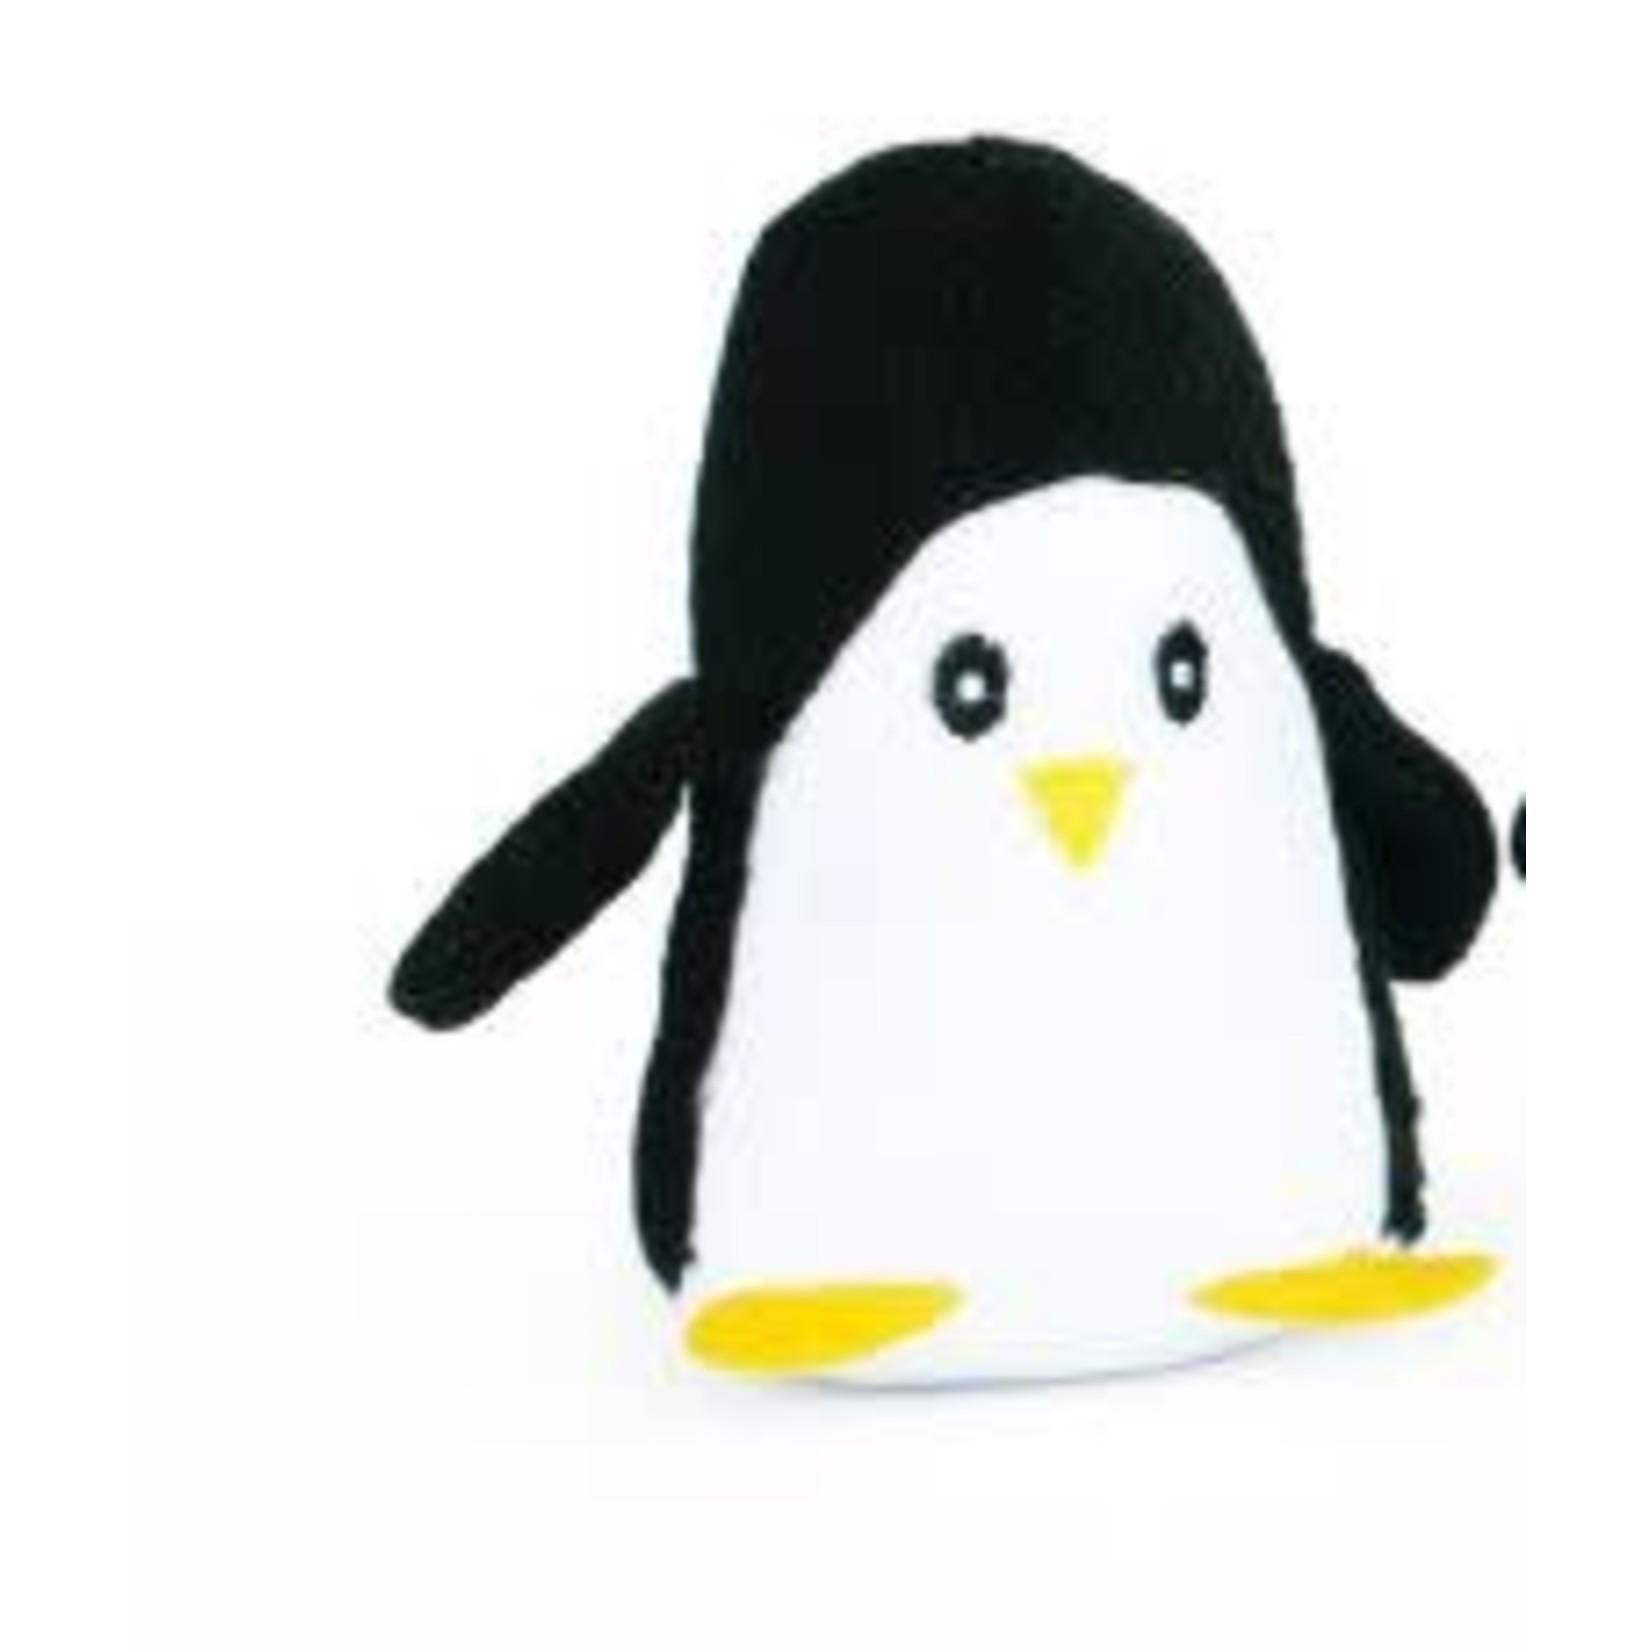 Zippy paws ZP Mini Squeaker Penguins  S Dog /puppy